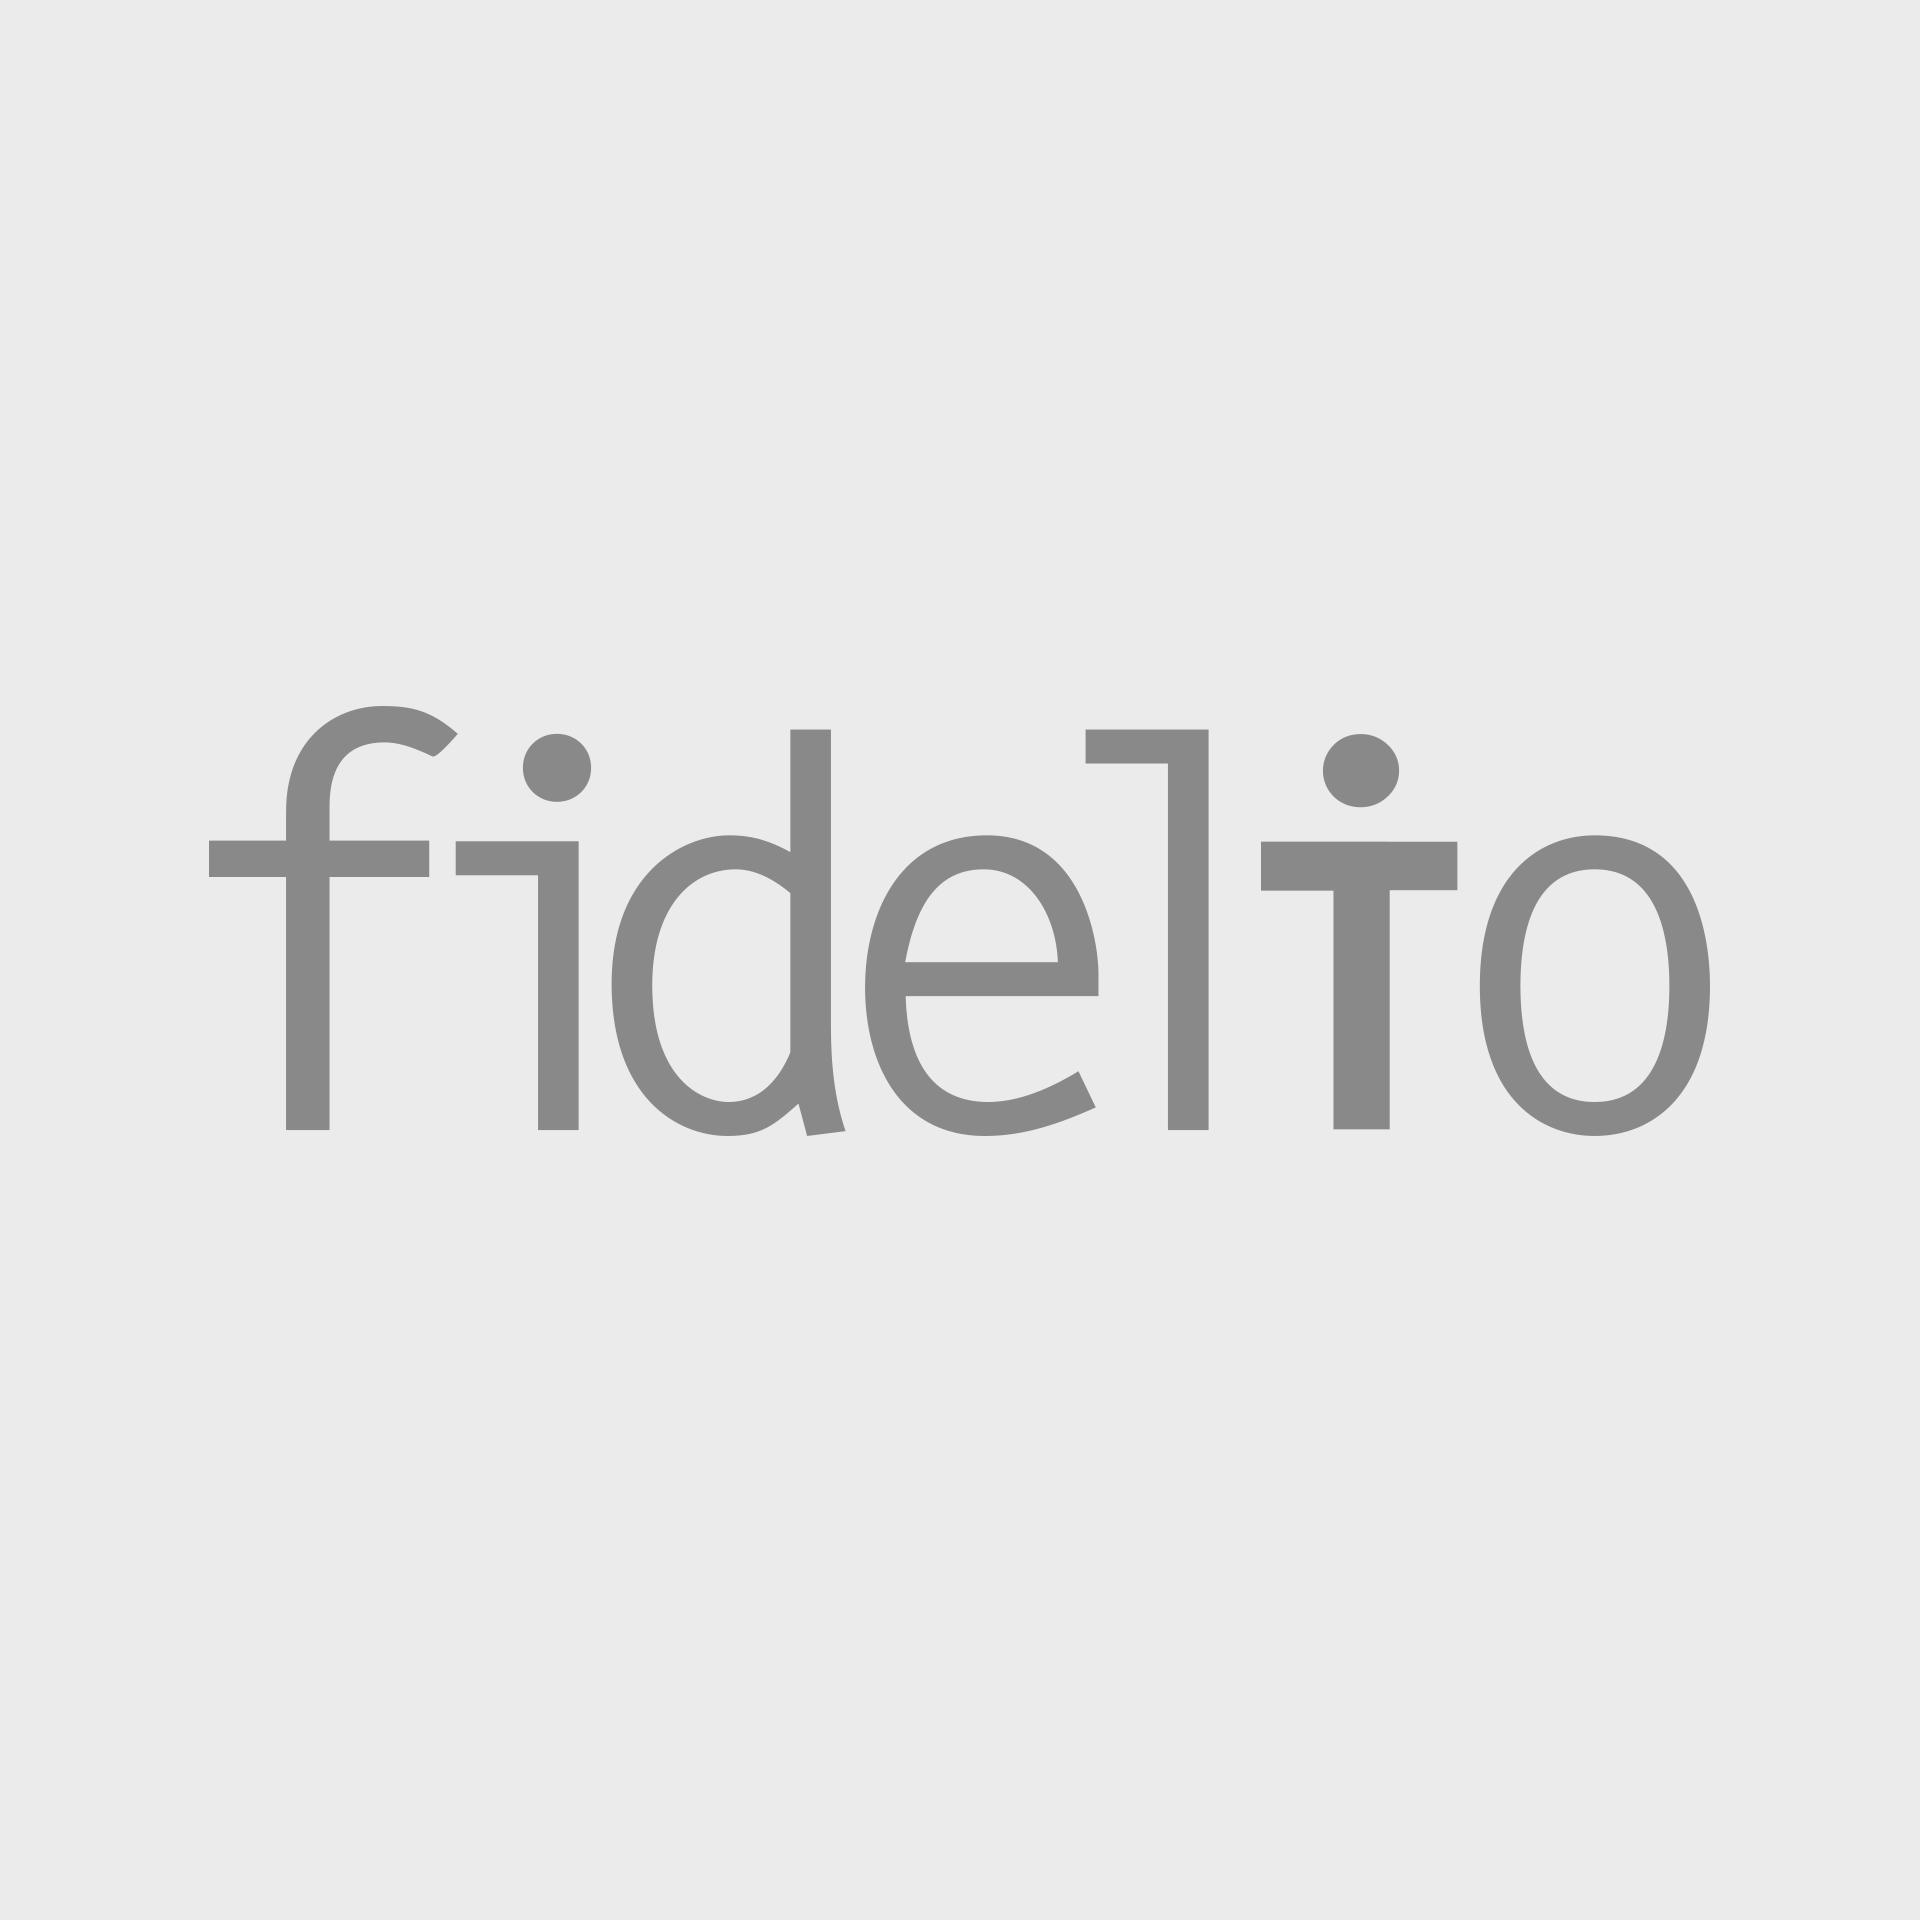 Fidelio Napi Zene – Arvo Pärt: Tabula Rasa